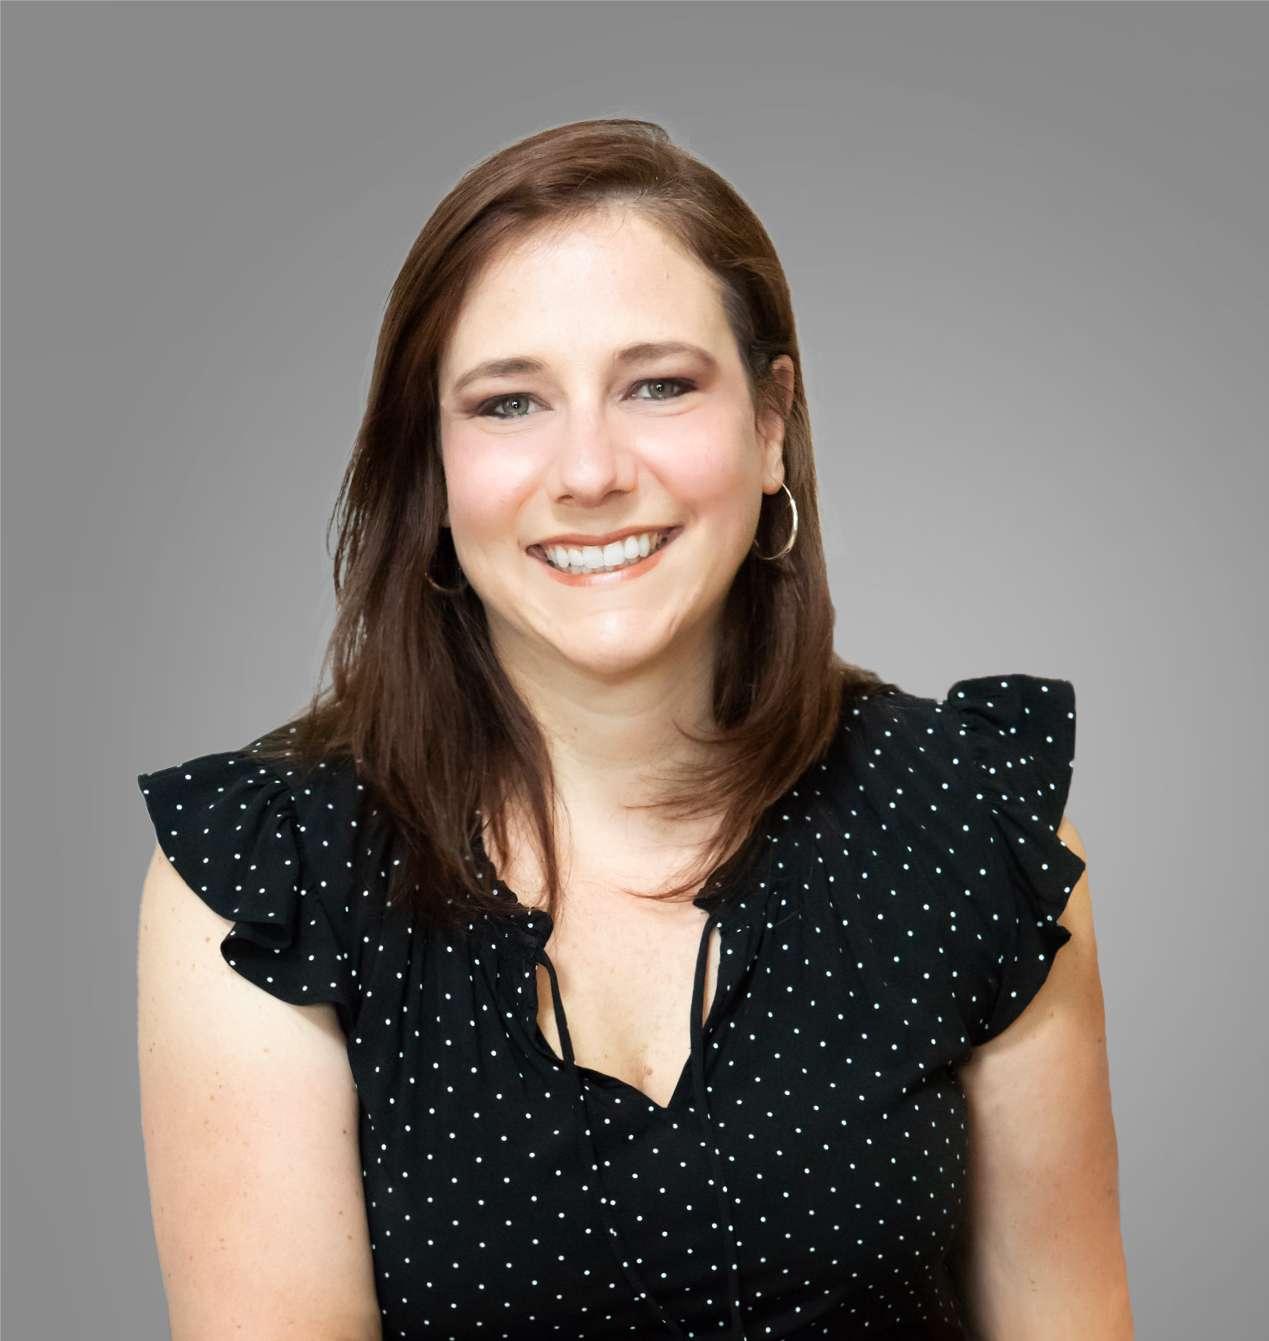 Sara Getchell